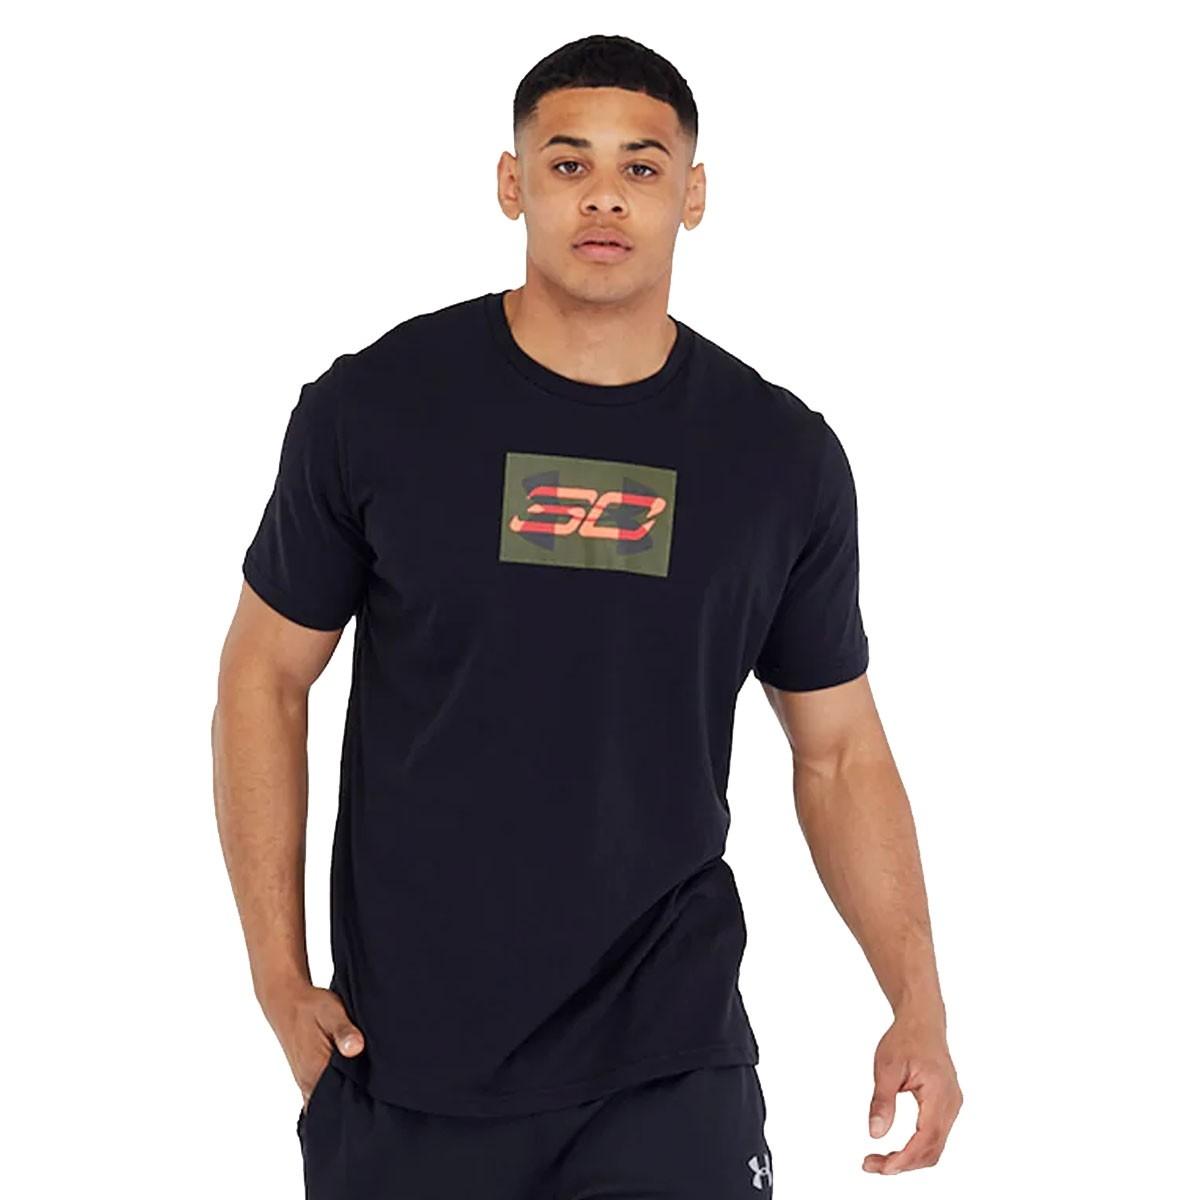 UA SC30 Overlay Short Sleeve T-Shirt 'Black'